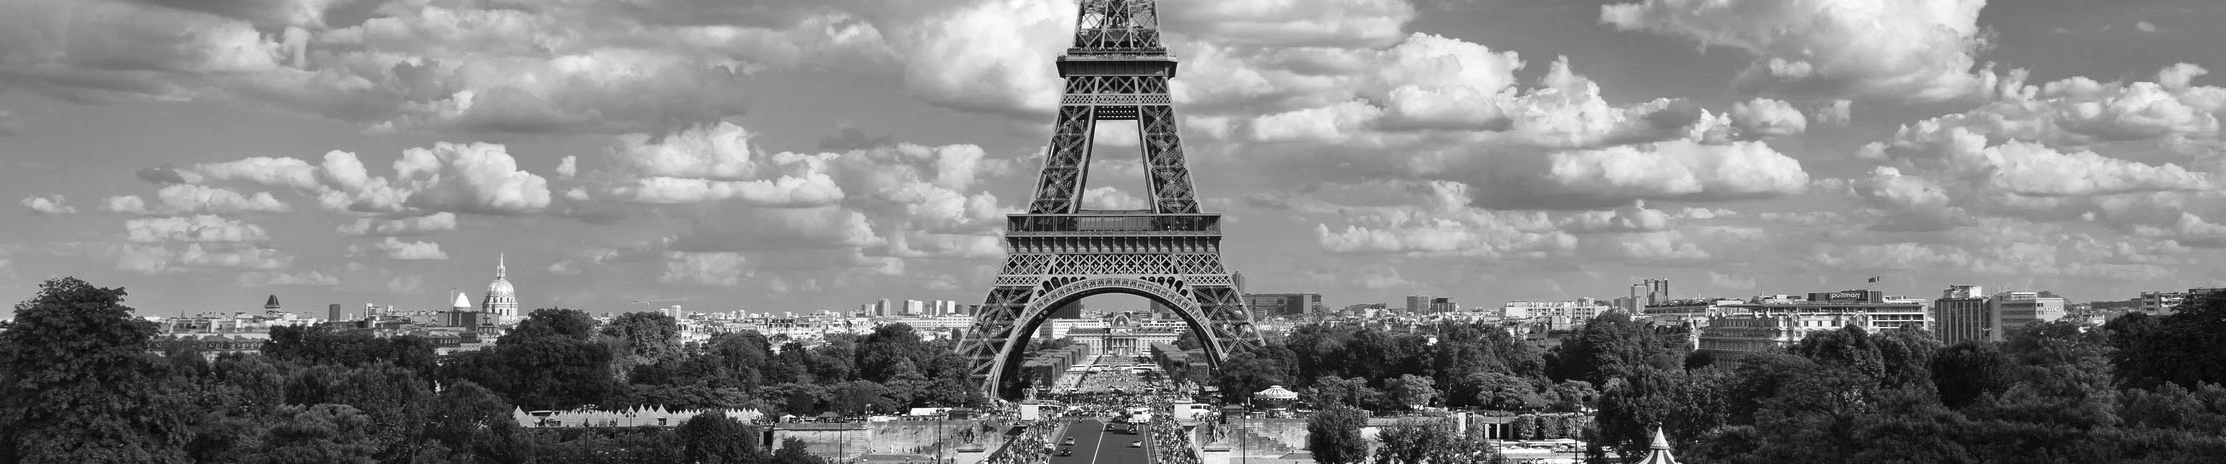 Fotolia_70197872-©-lapas77-Paris-slider-v2